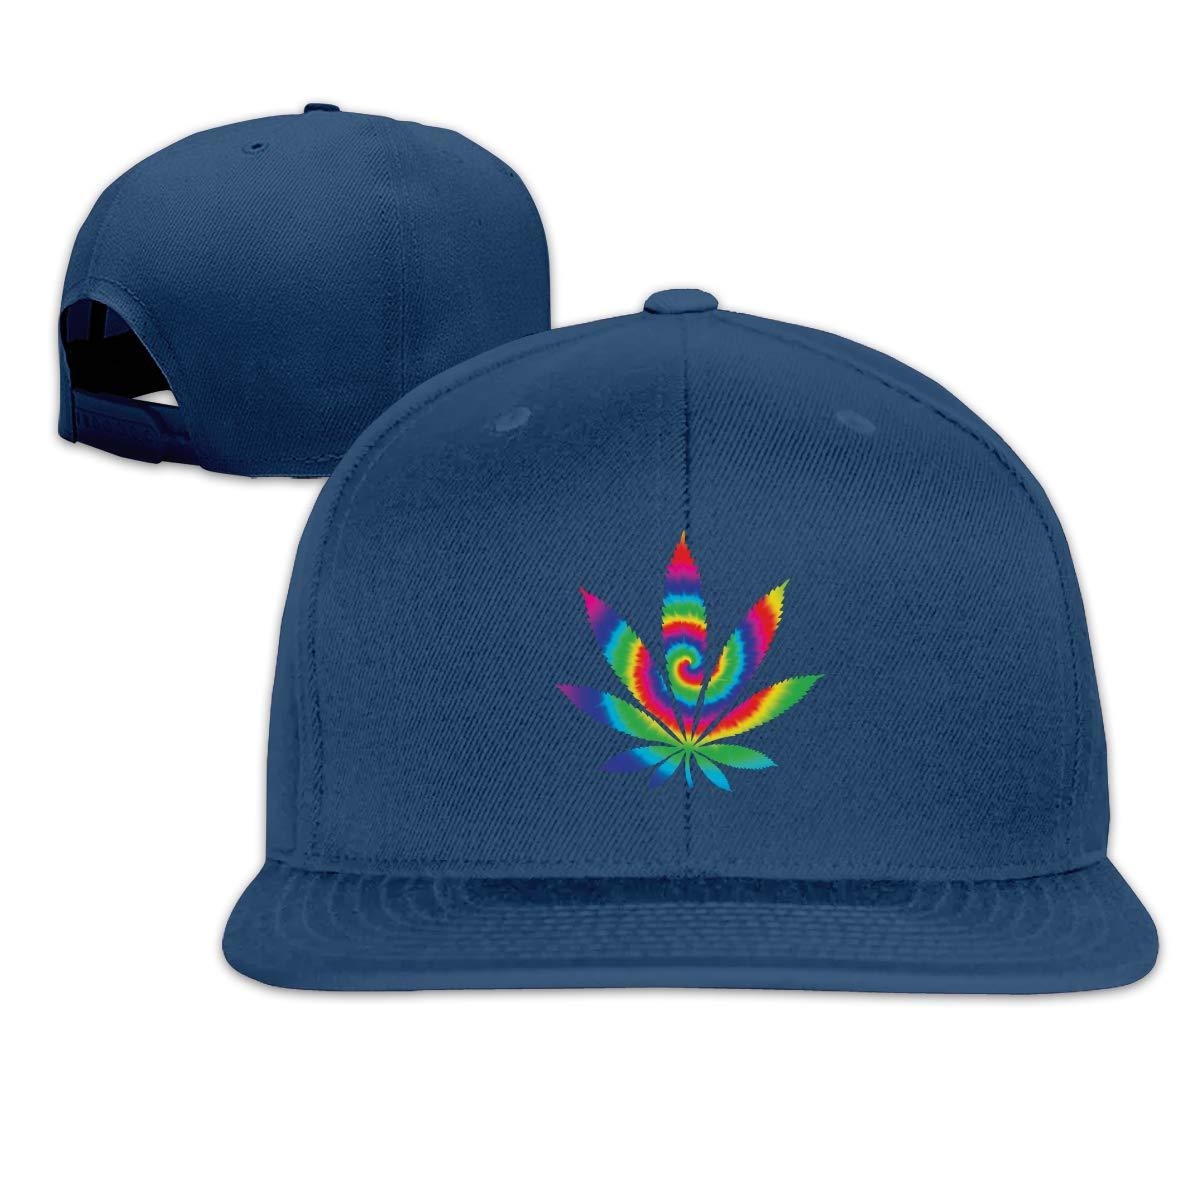 MOCSTONE Unisex Snapback Hat Tie Dye Weed Adjustable Baseball Cap